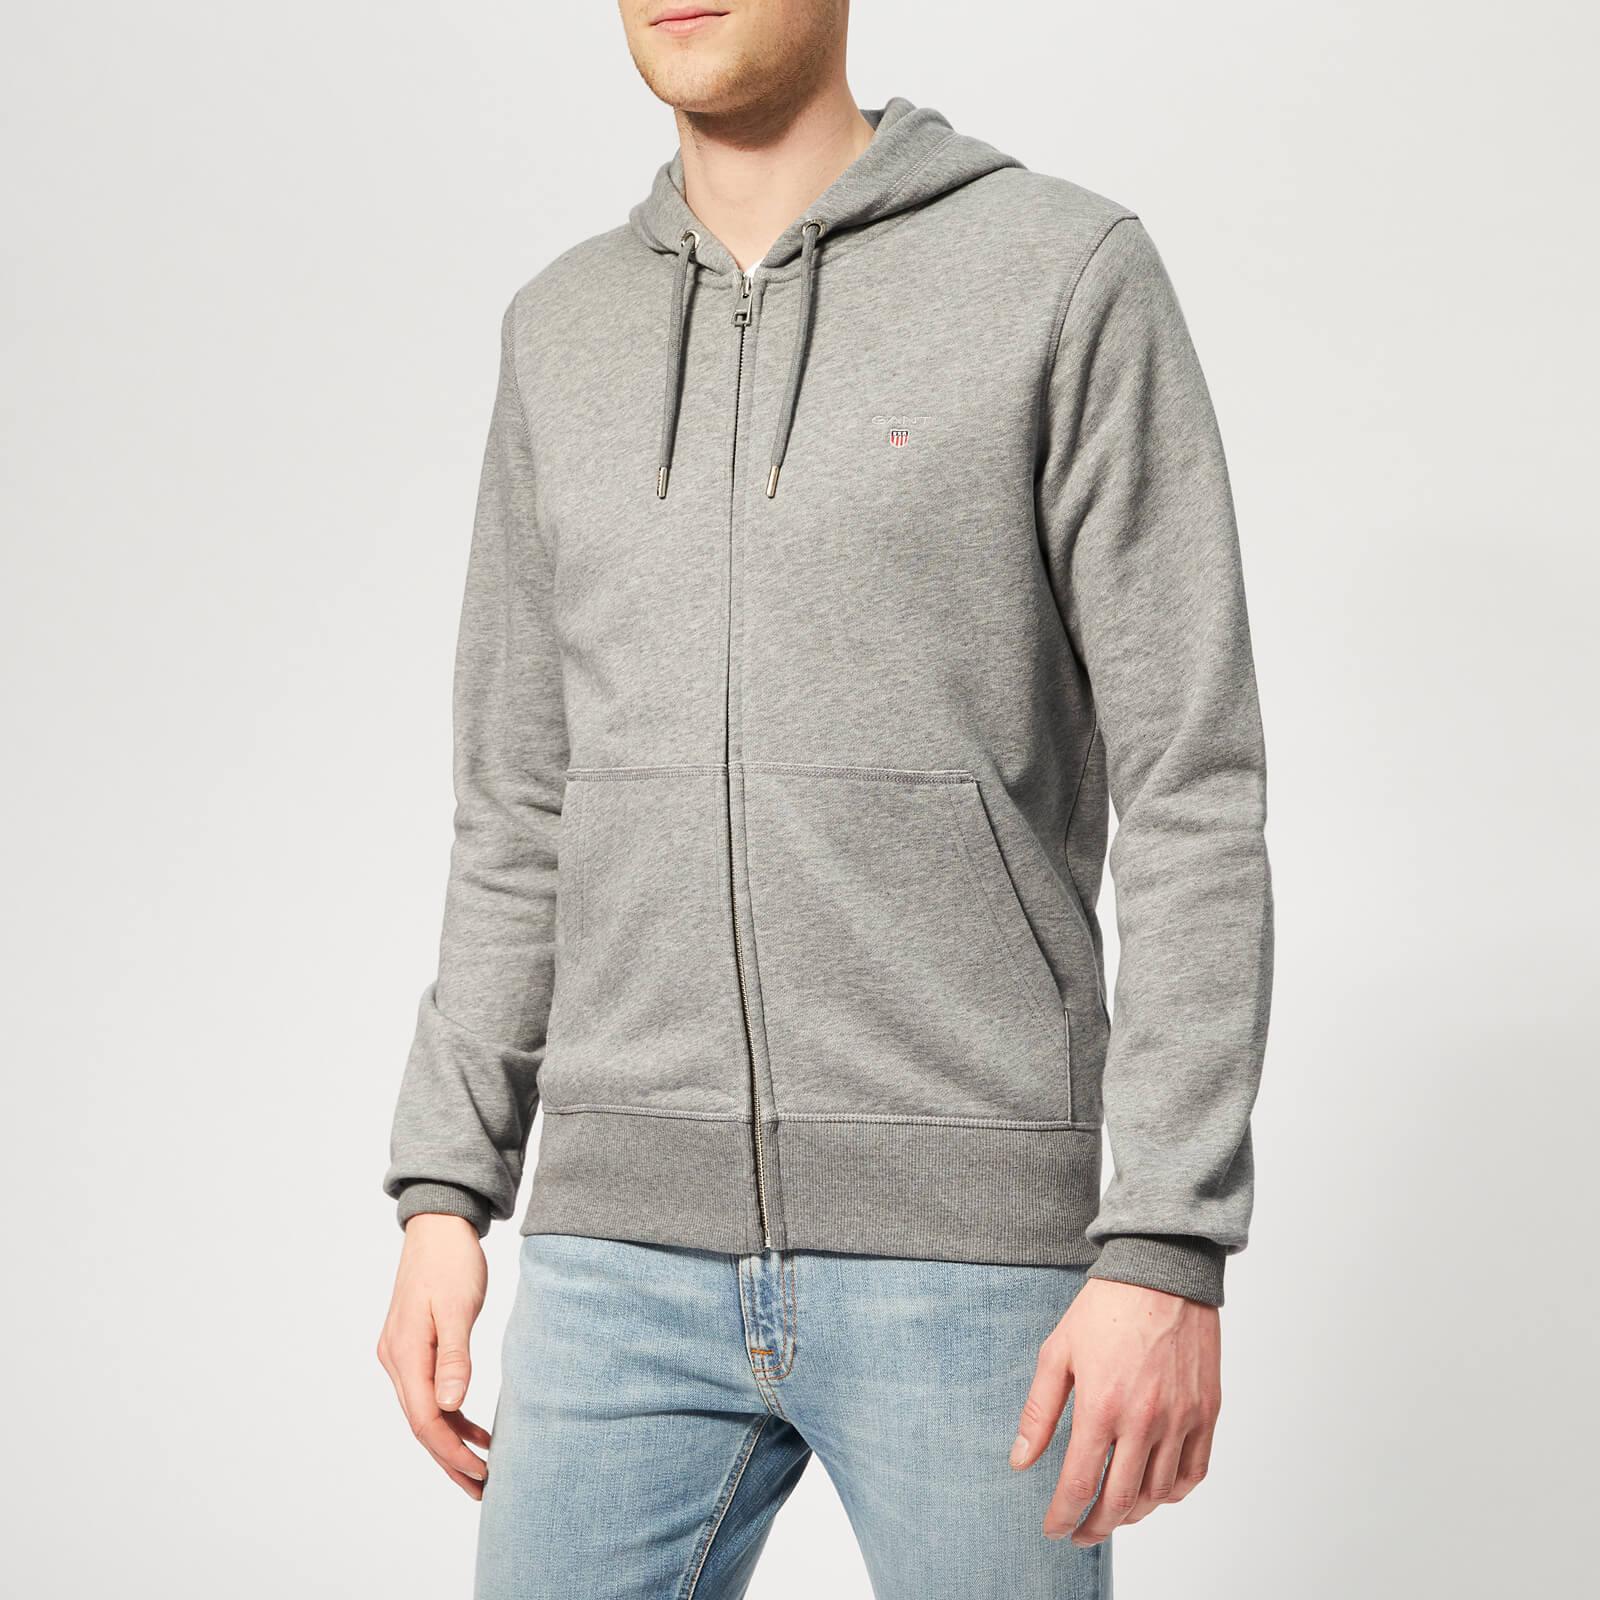 18e7571e GANT Men's The Original Full Zip Hoodie - Dark Grey Melange Mens Clothing |  TheHut.com